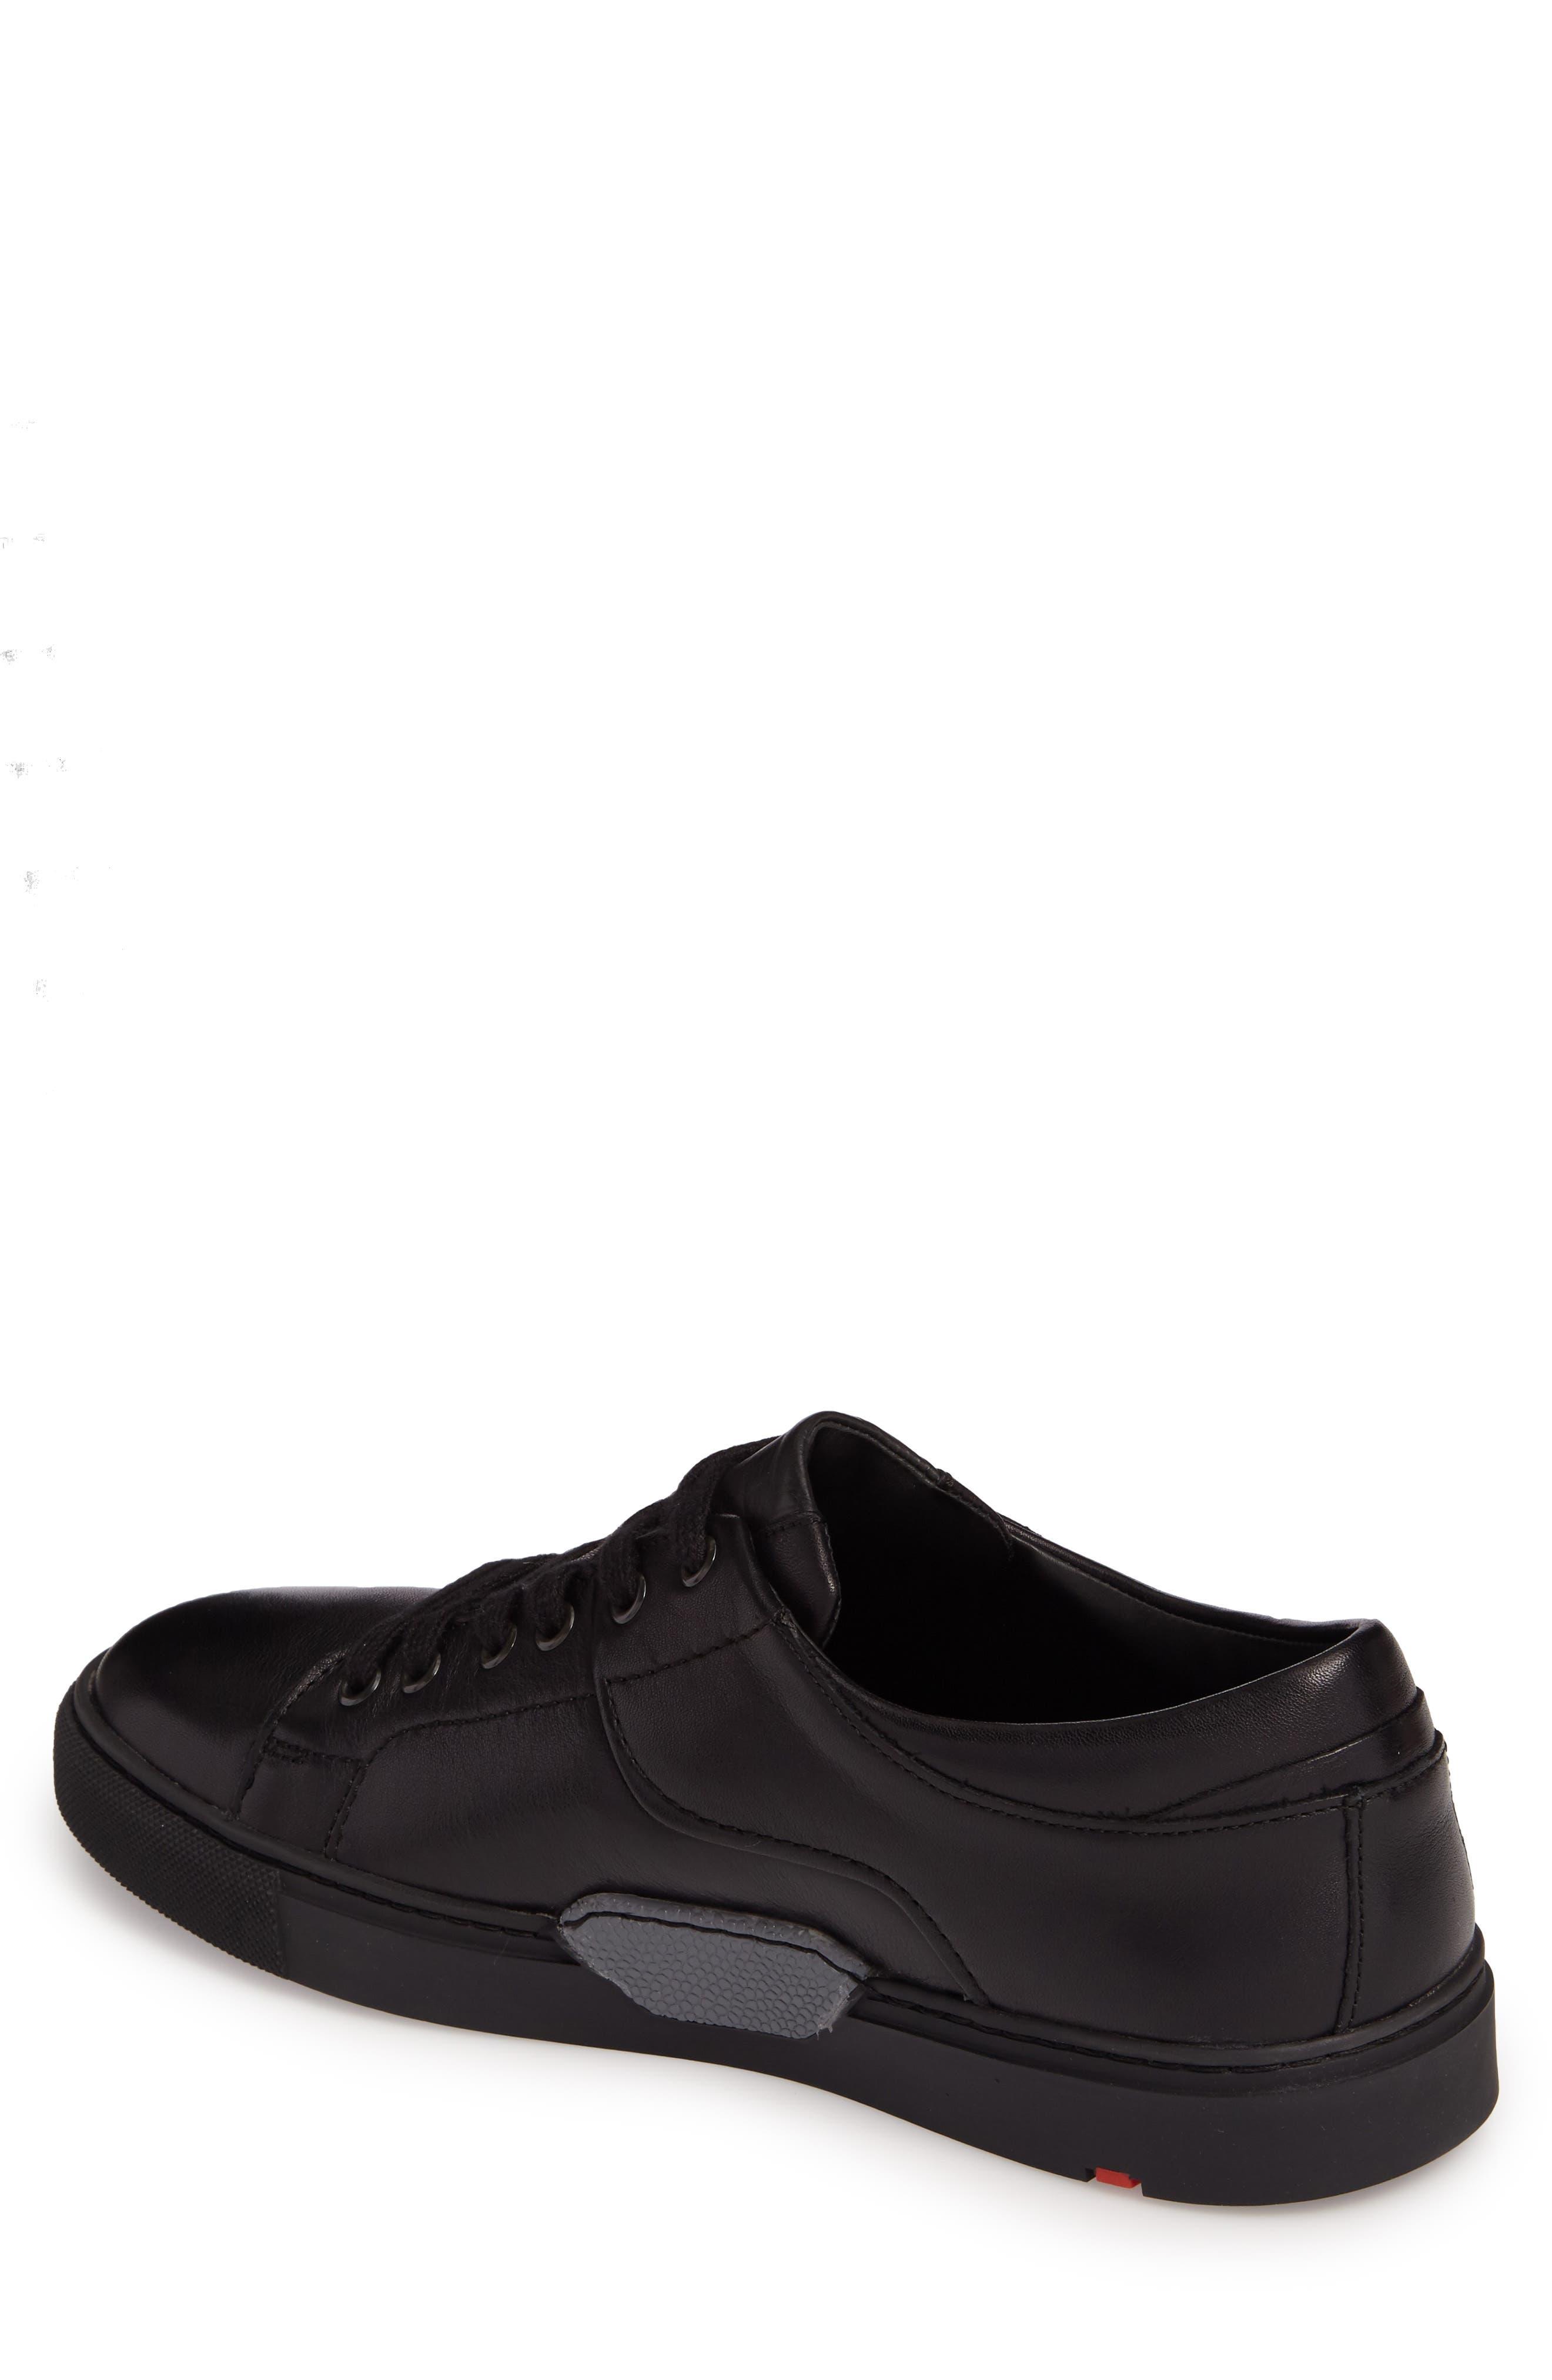 Adamson Sneaker,                             Alternate thumbnail 2, color,                             Black